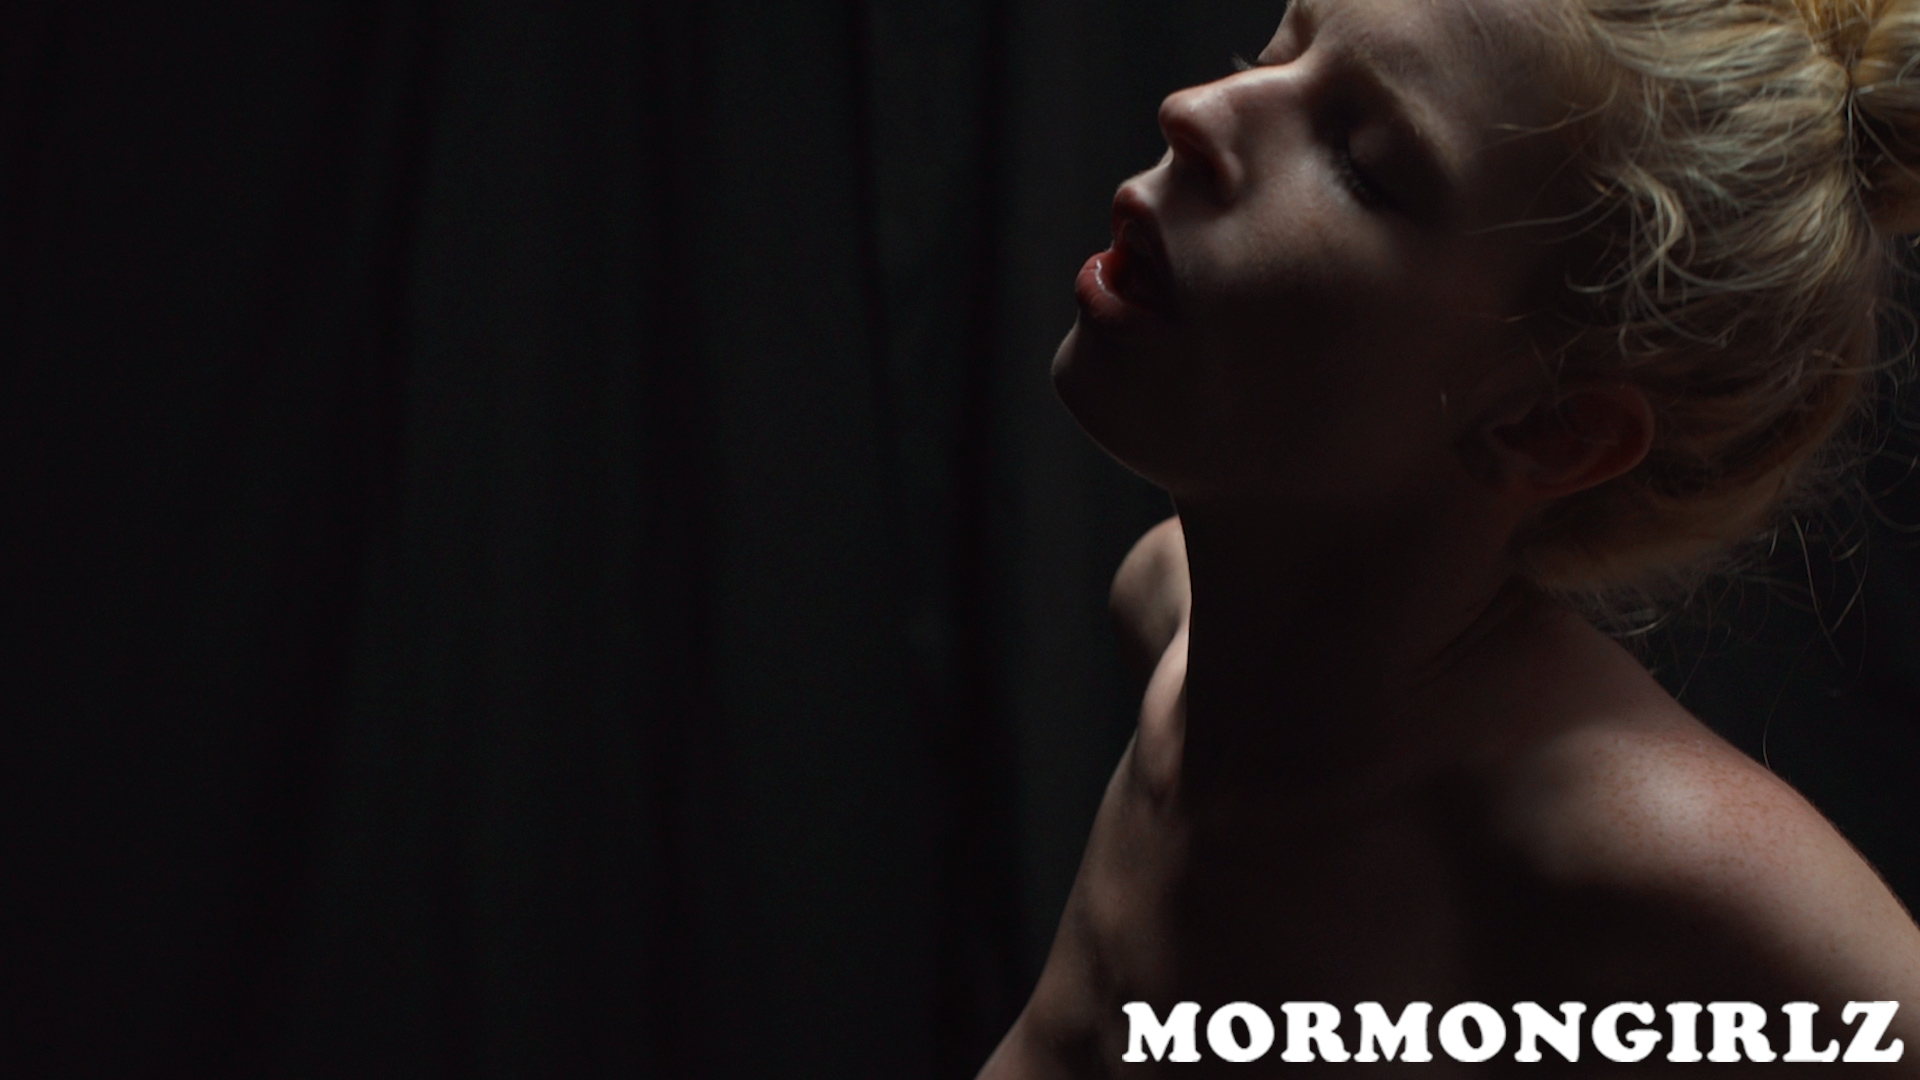 mormongirlz_74_16